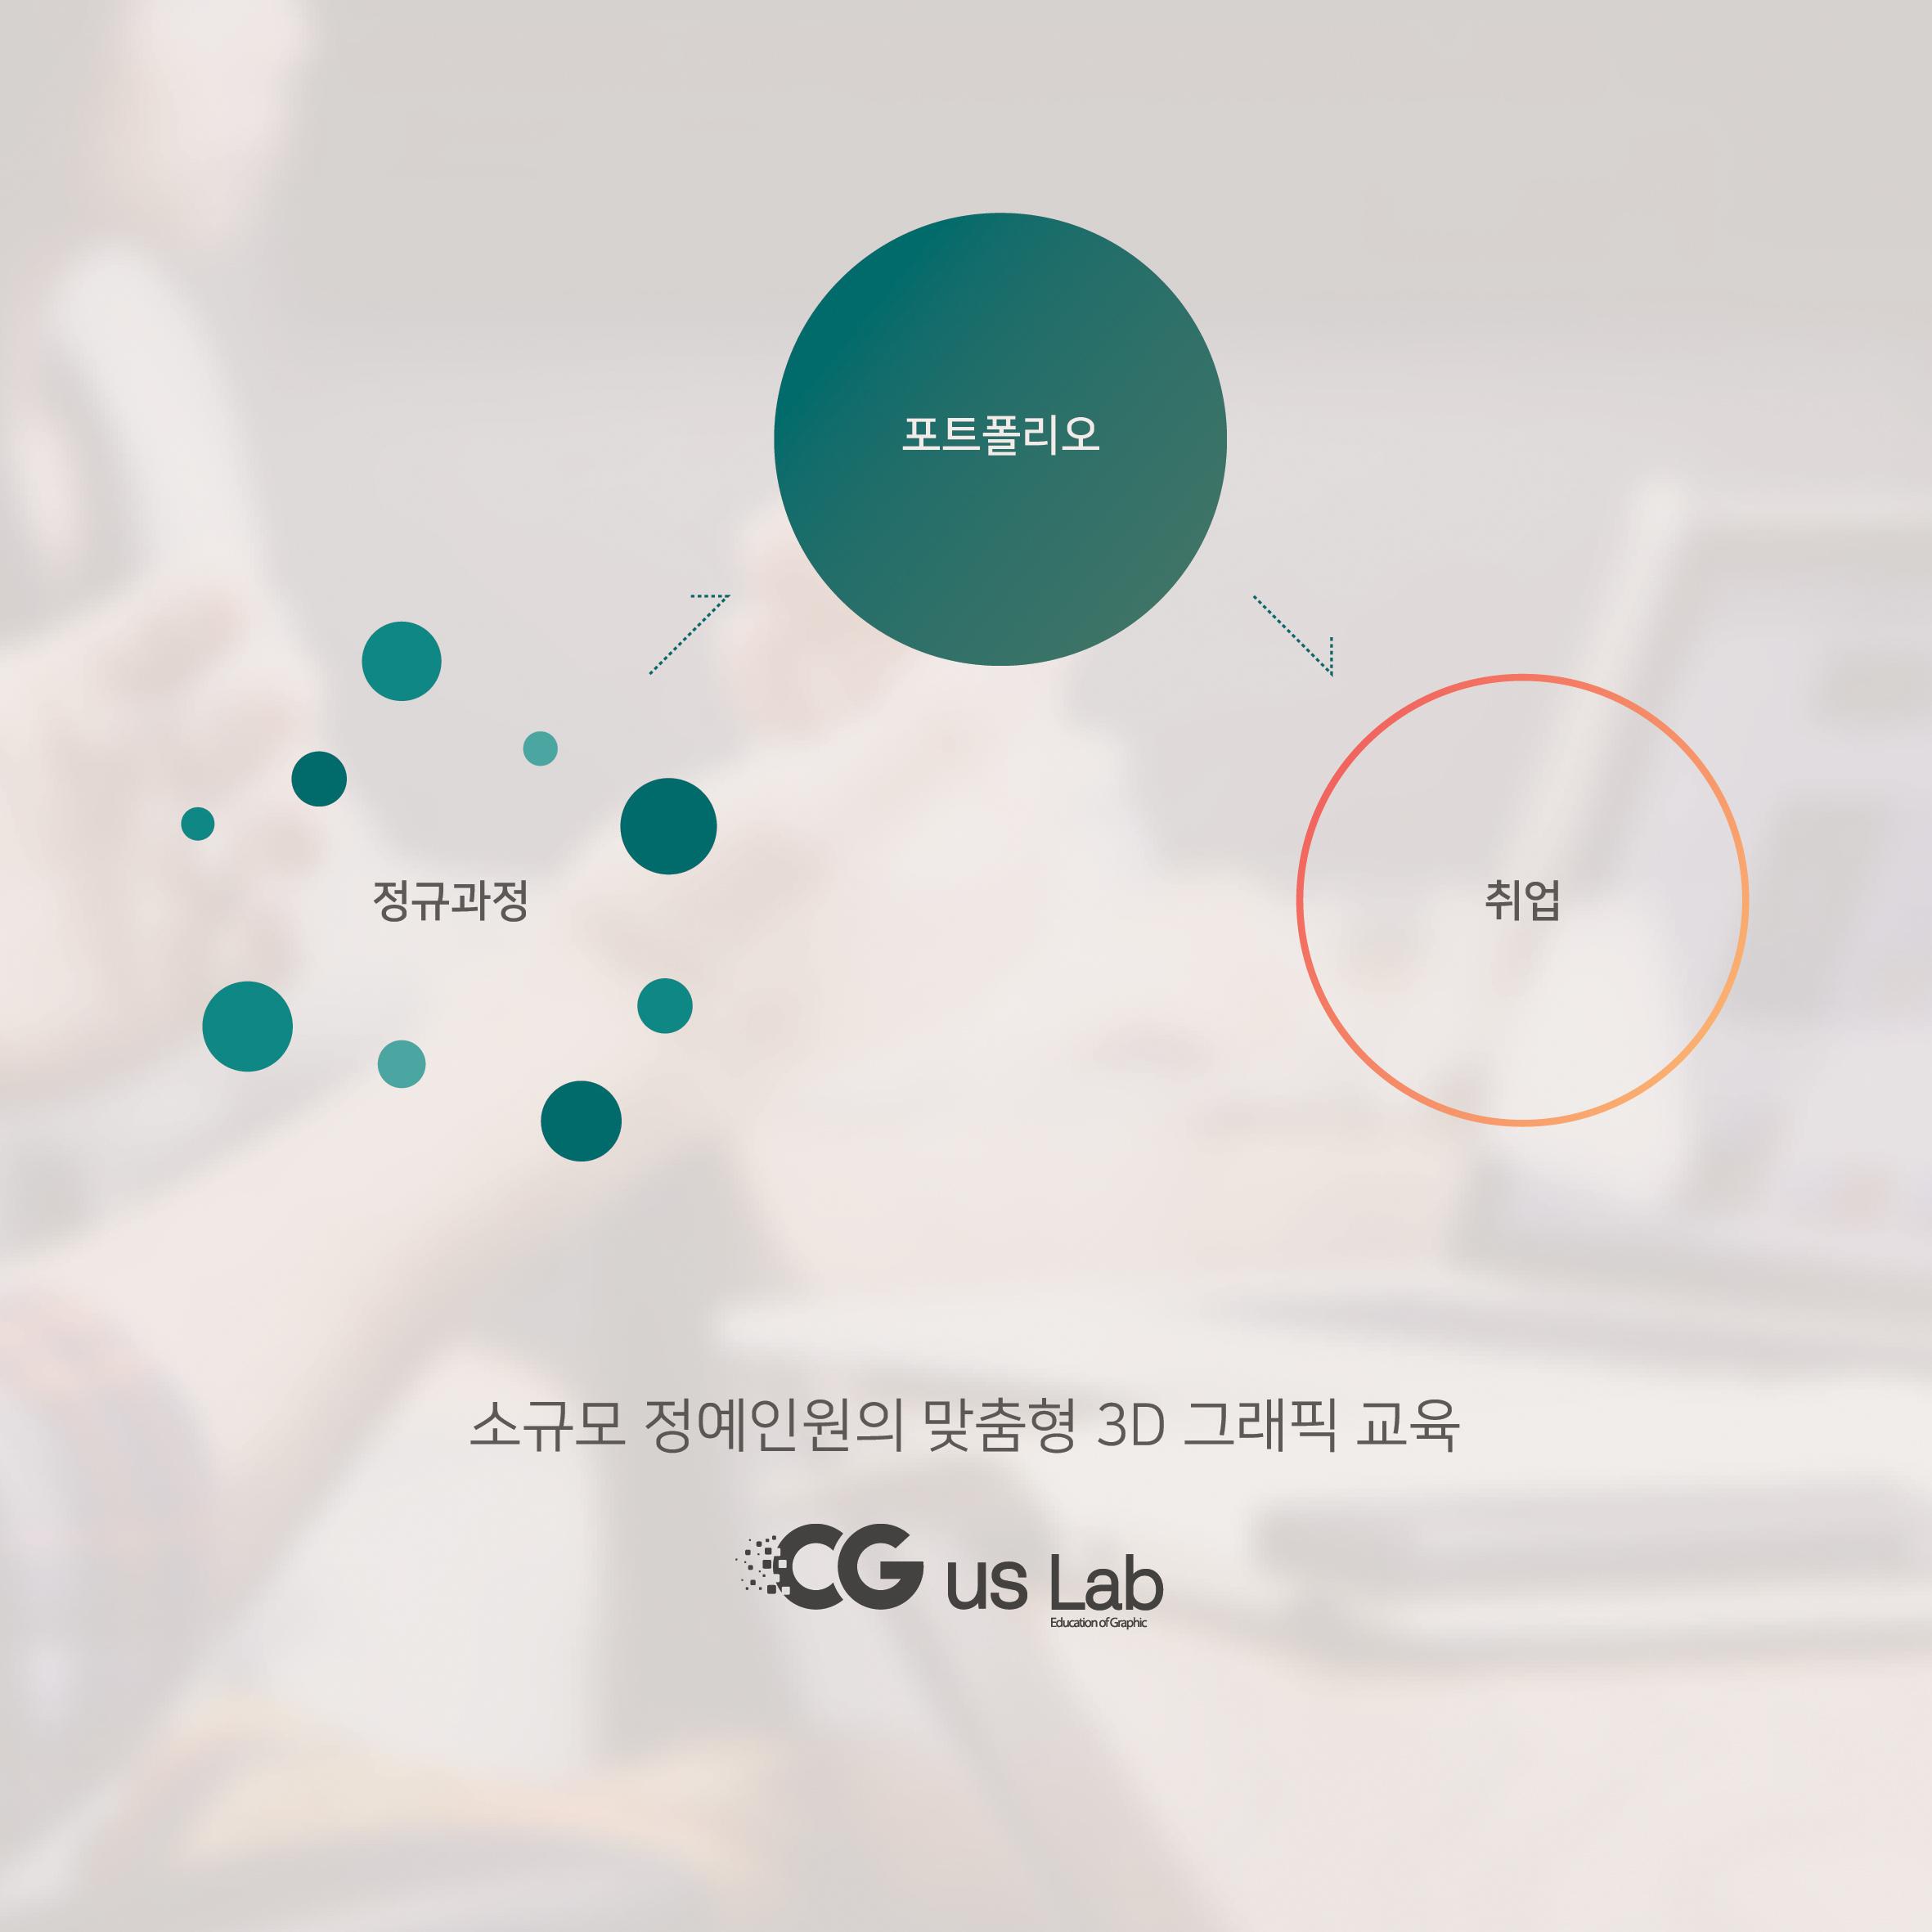 ◀ CGusLab ▶ 8명 정원의 소규모 그룹과외! 3D기초정규과정 [4월5일] 개강인원모집! - PR - CGlink : 06.jpg